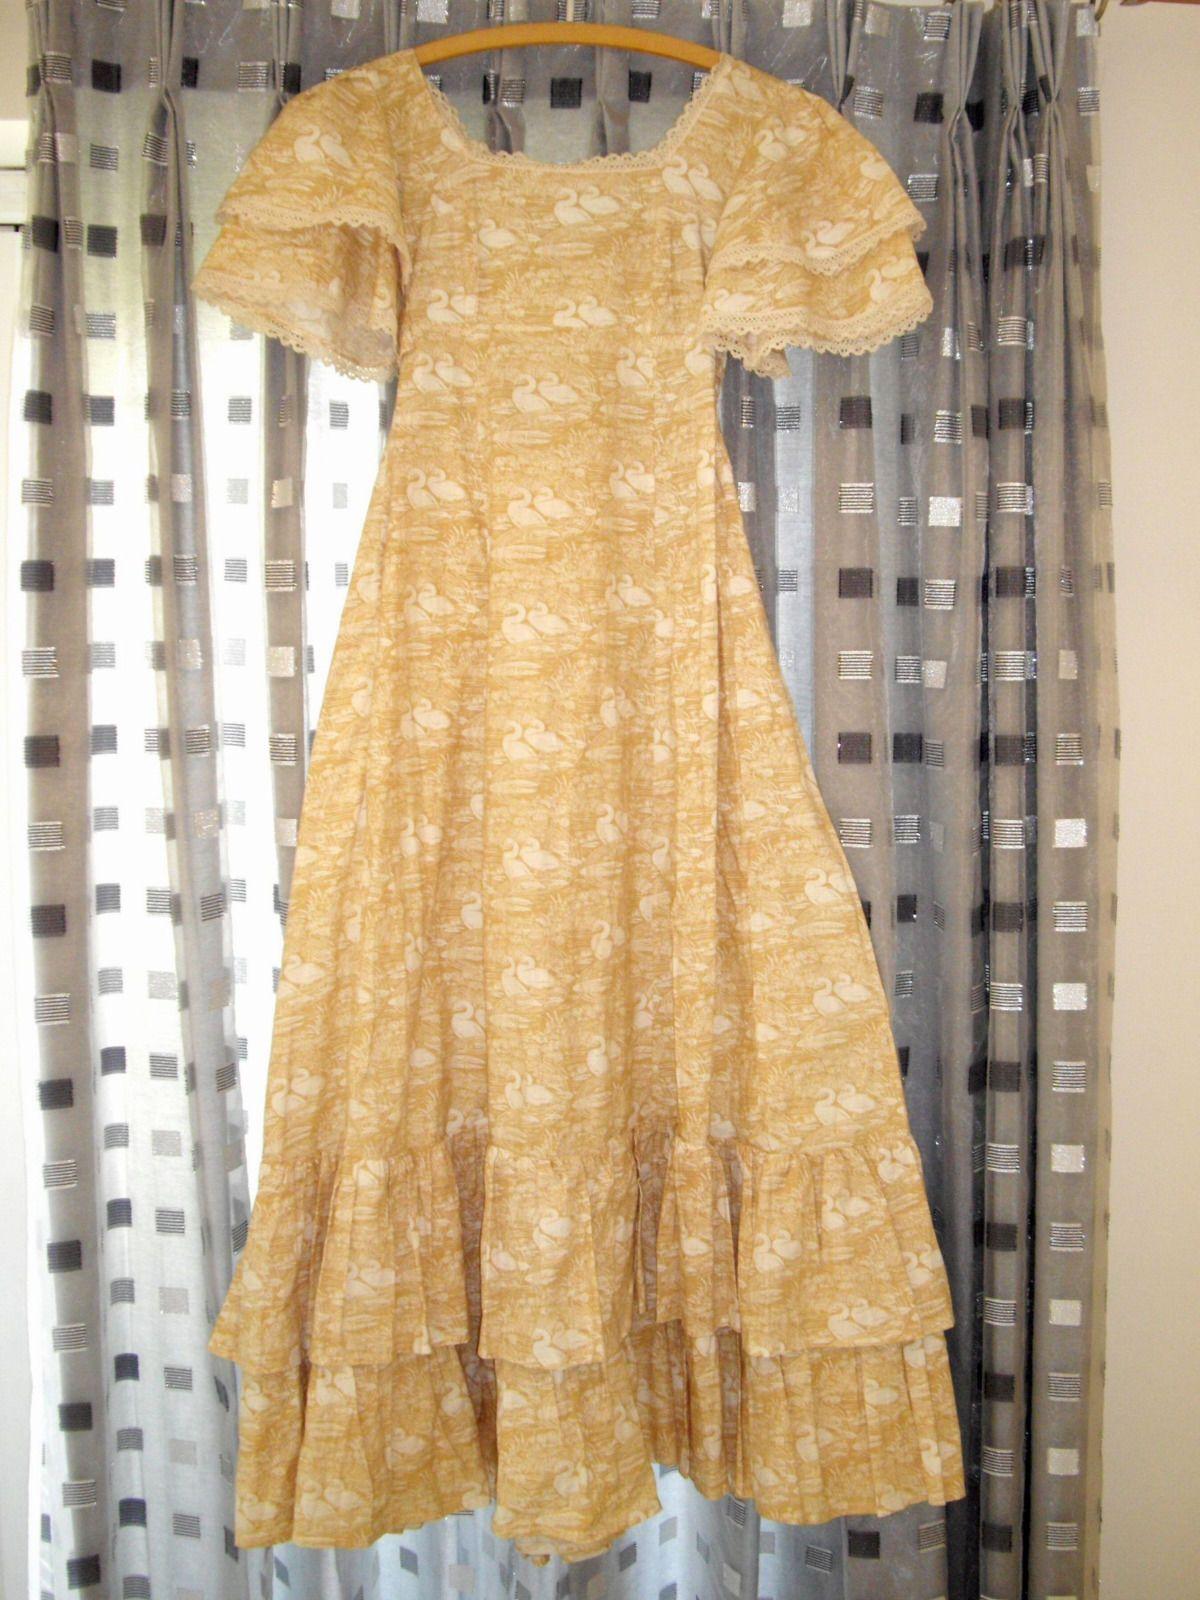 Laura Ashley Vintage 1970s Dress Swan Print Size 14 Ebay